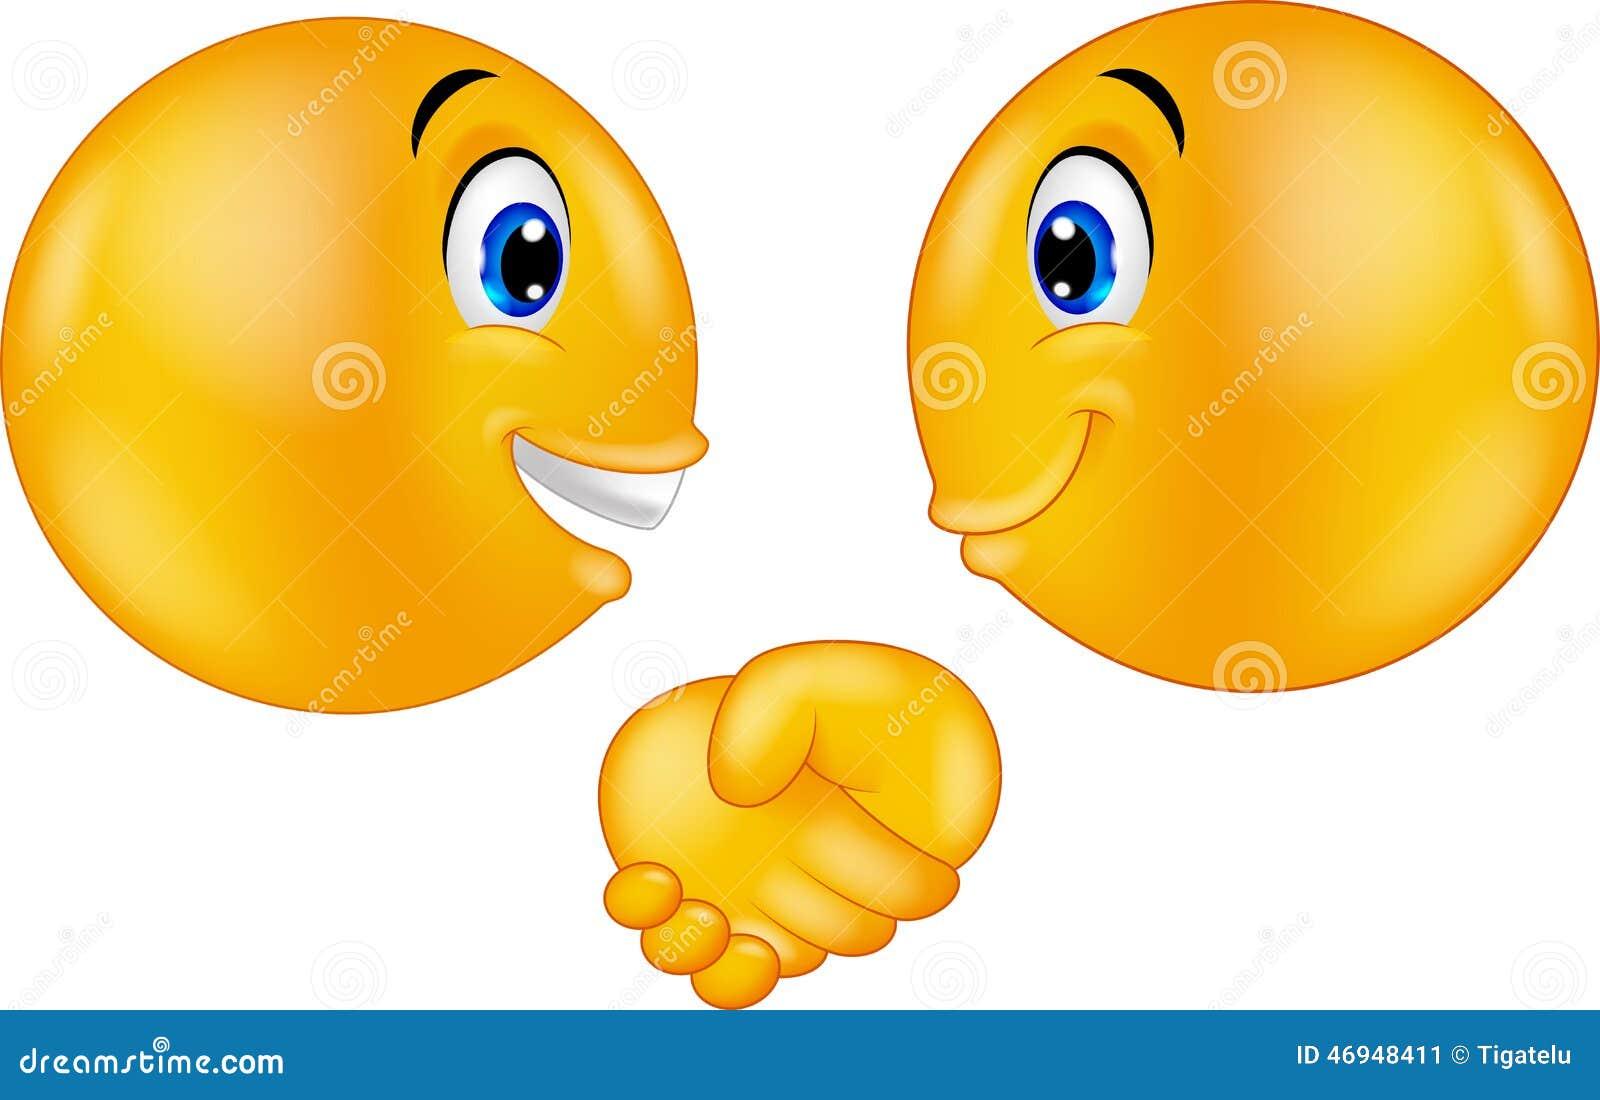 cartoon emoticons shaking hands stock vector image 46948411 handshake vector handshake vector